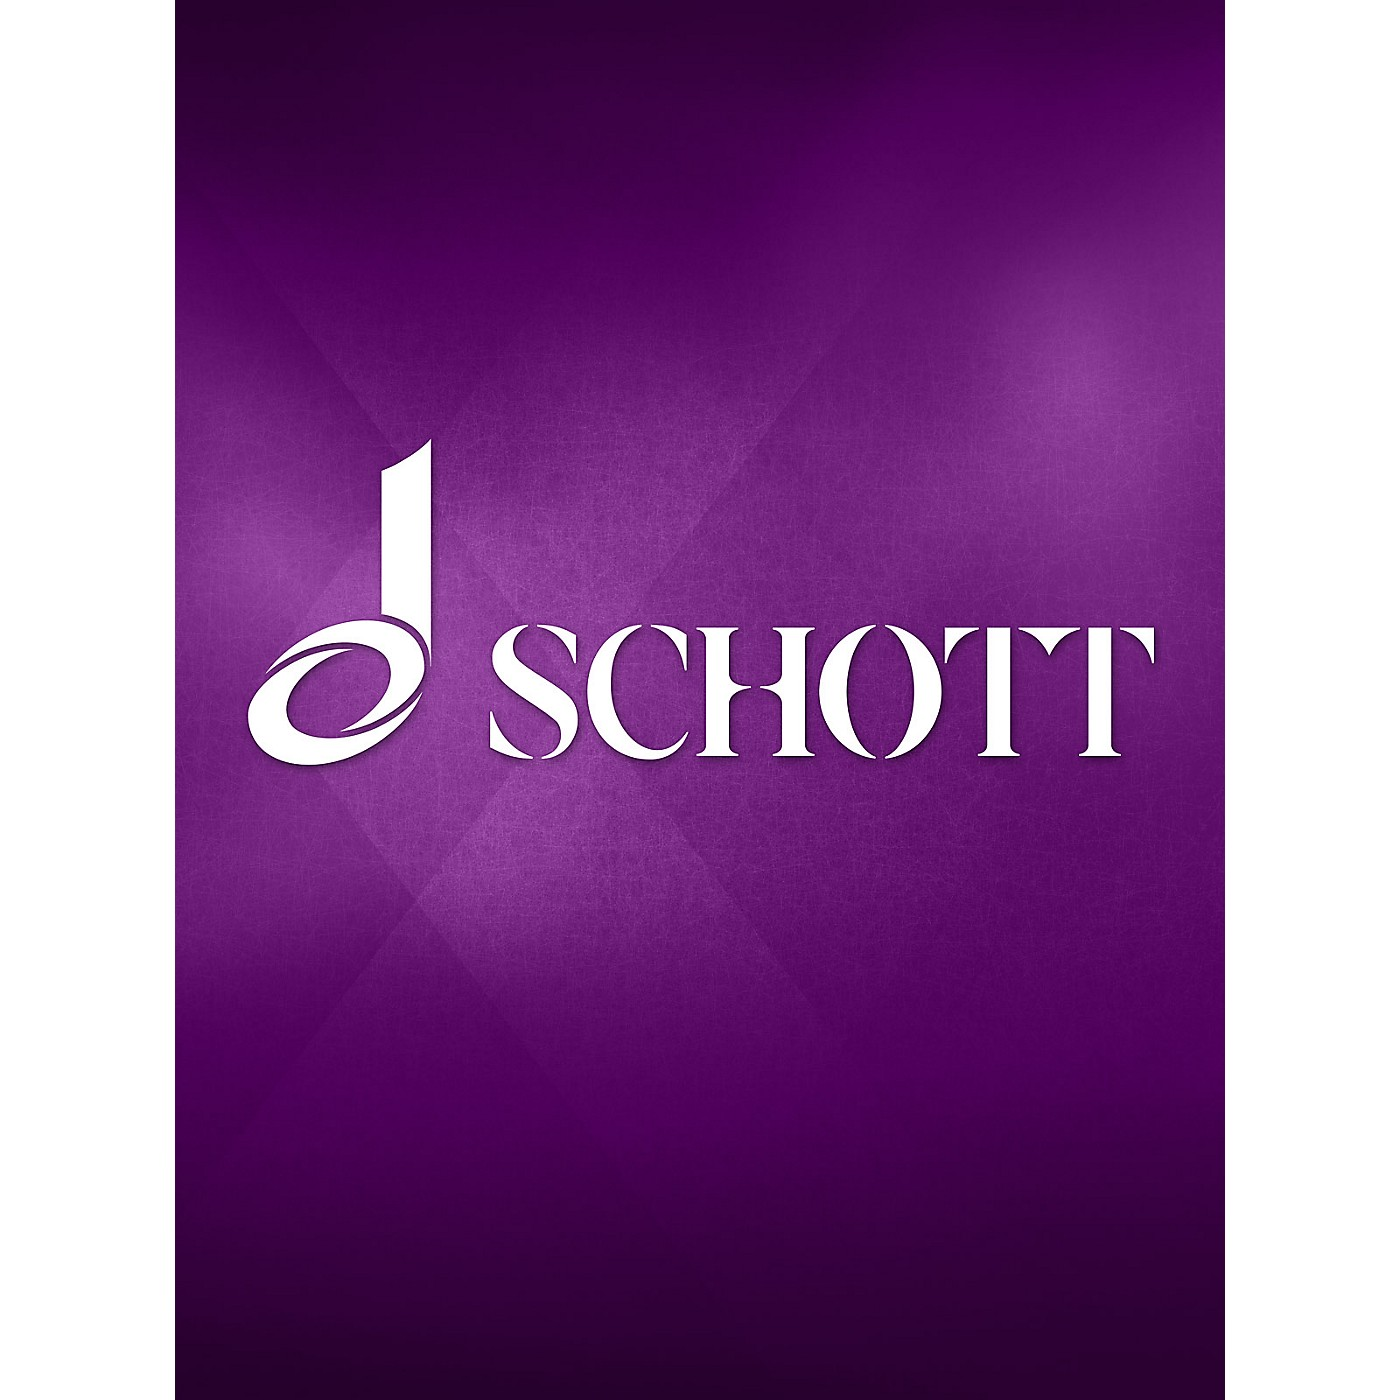 Boelke-Bomart/Schott Sonata a Cinque (Score) Schott Series Softcover by George Perle thumbnail